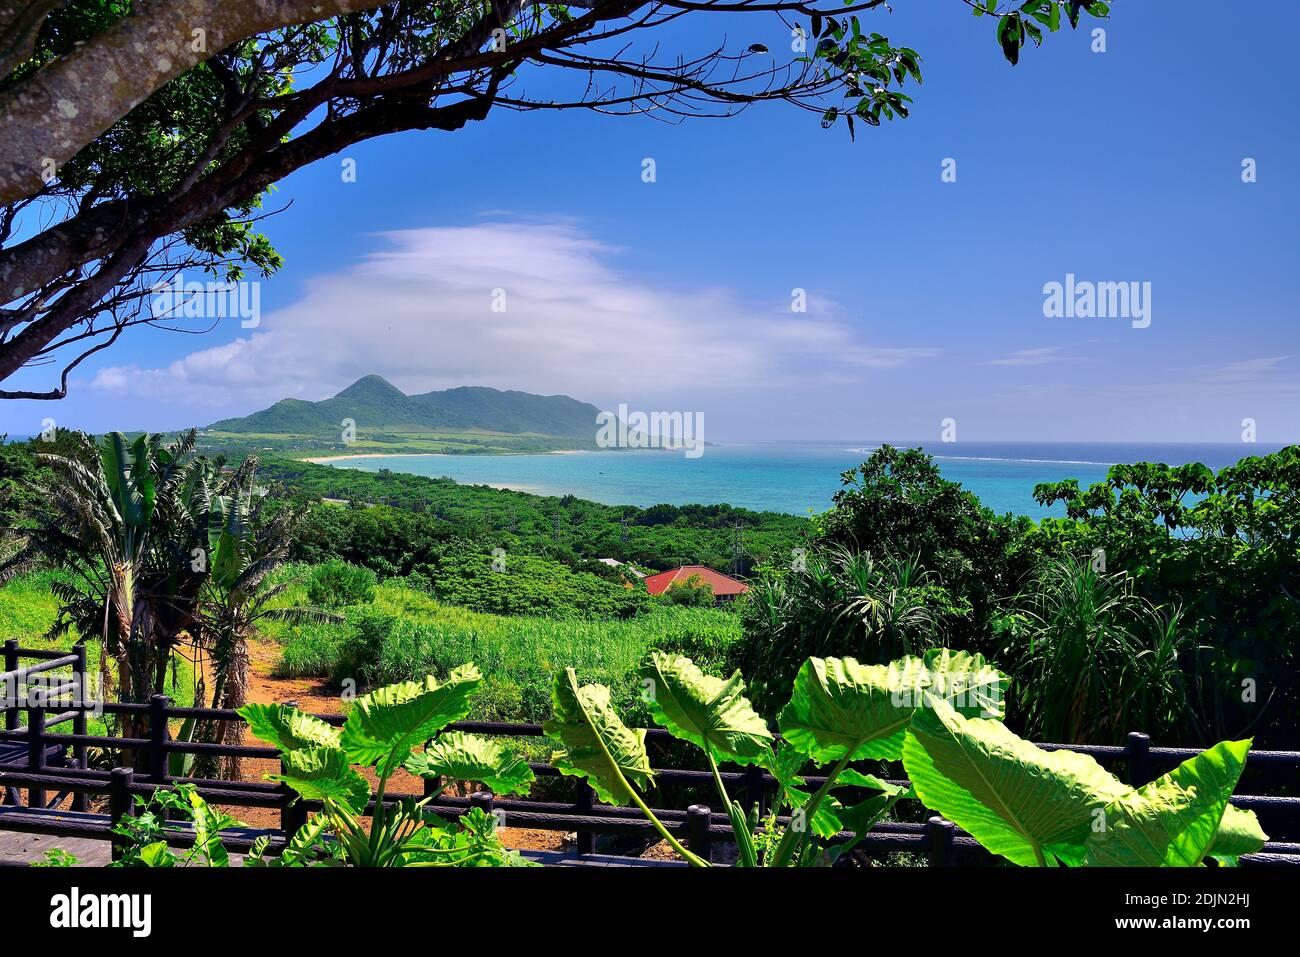 Wide View, From Tamatorizak, Ishigaki, Yahema Islands, Okinawa, Ryukyu Islands, Japan Stock Photo